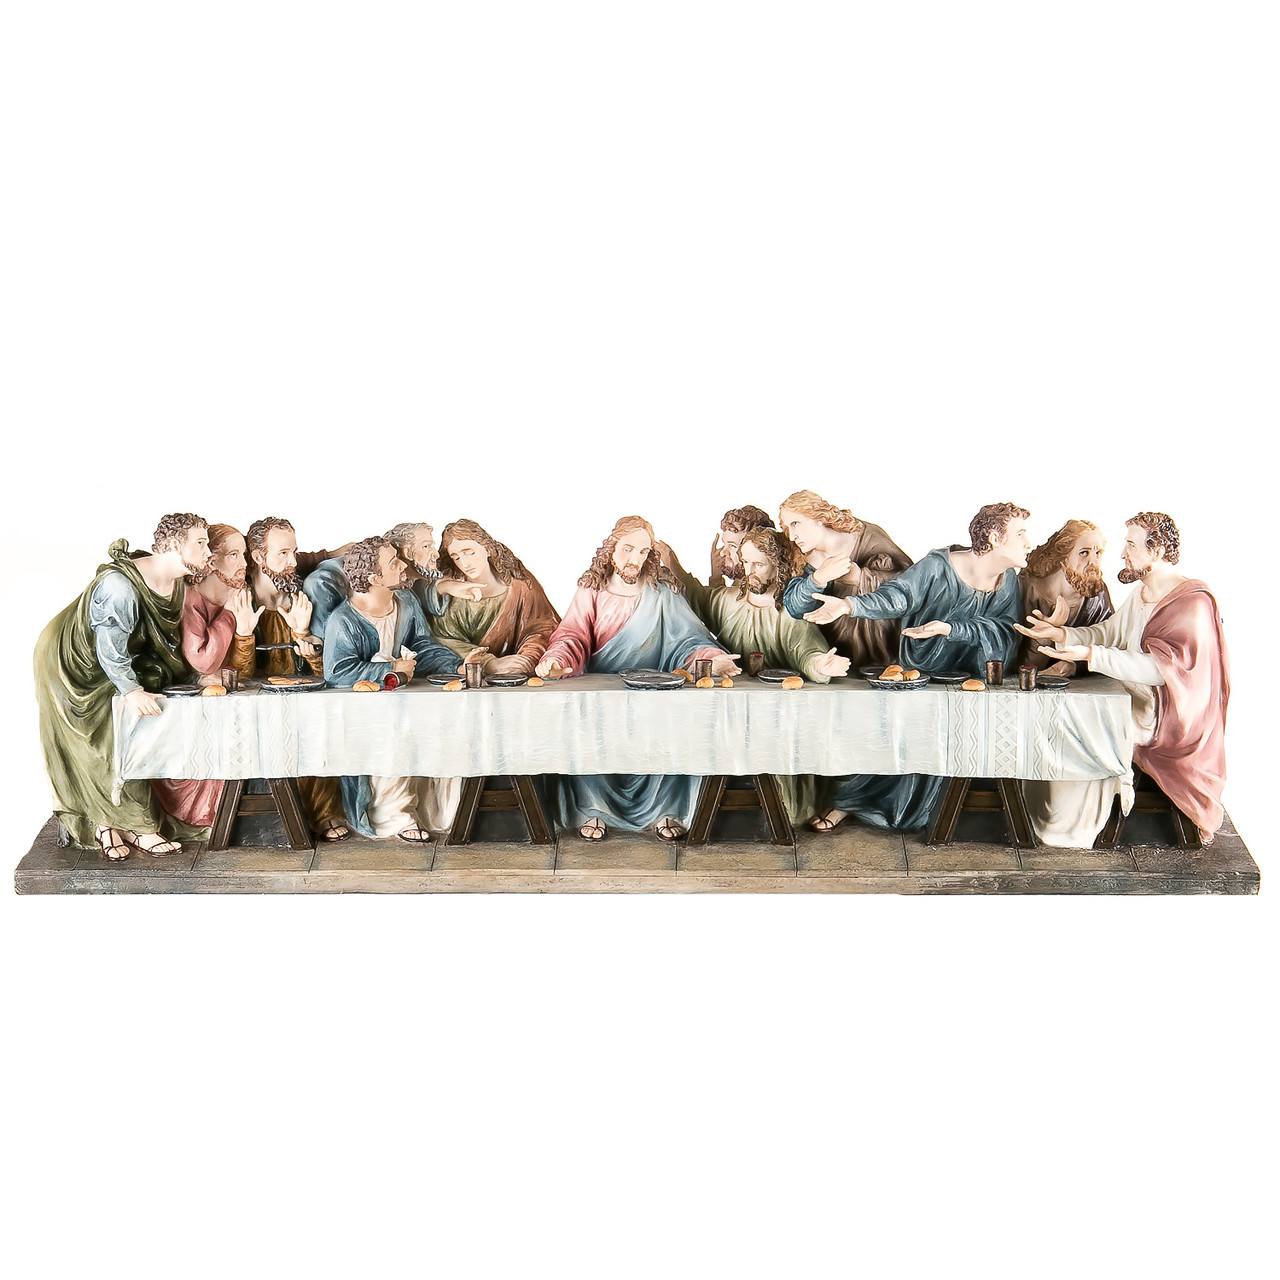 Статуетка Veronese Таємна вечеря 71 см полістоун